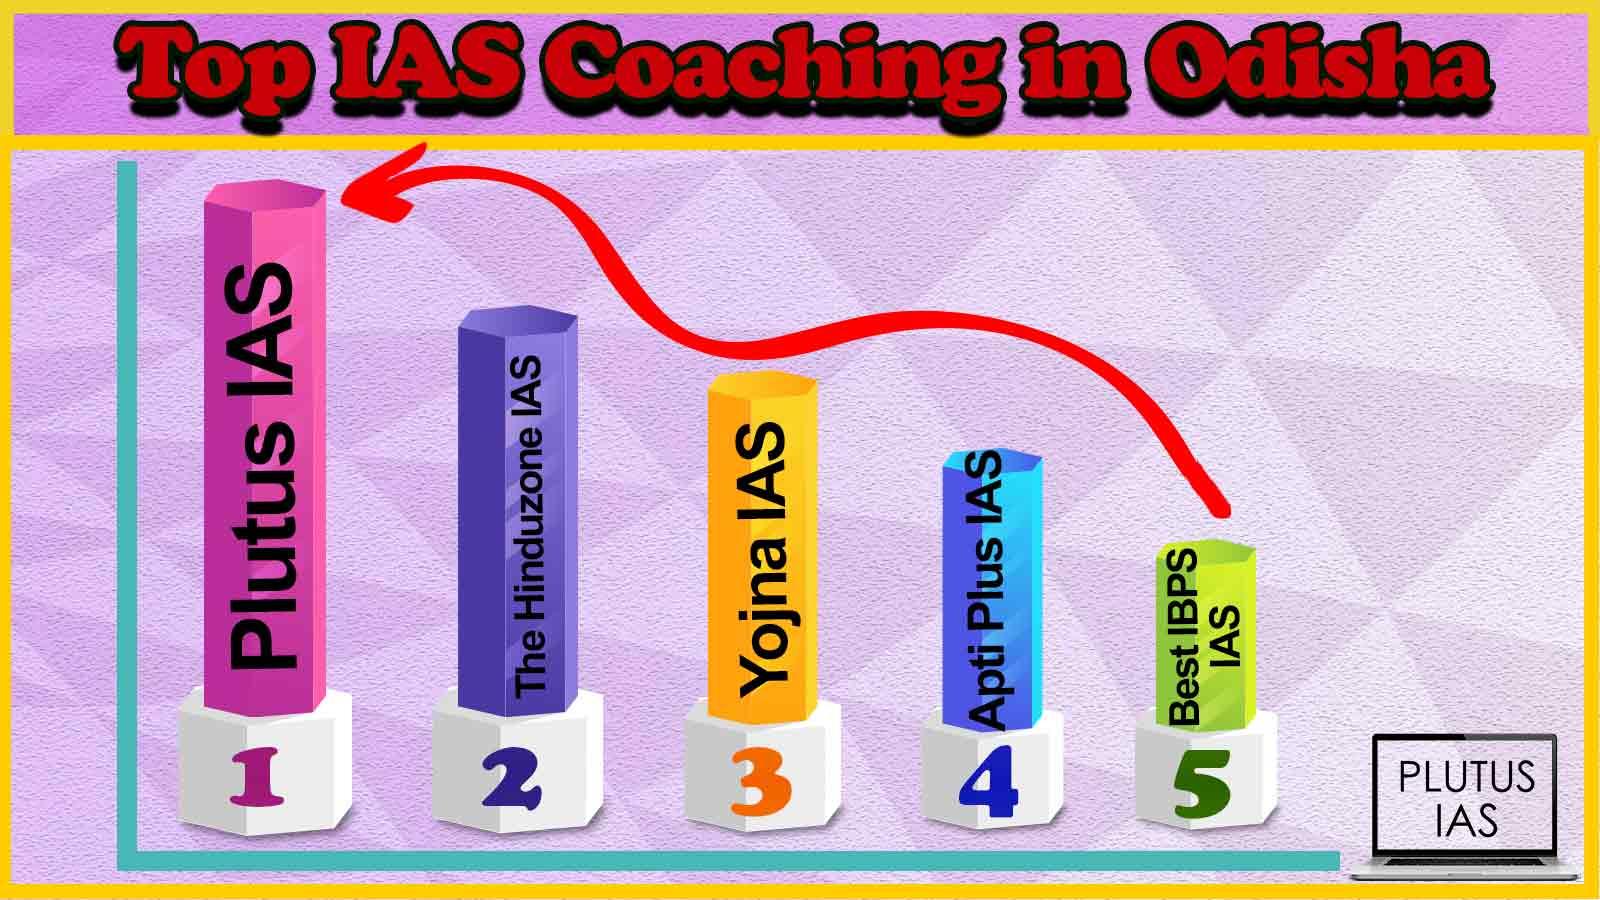 Best 10 IAS Coaching in Odisha